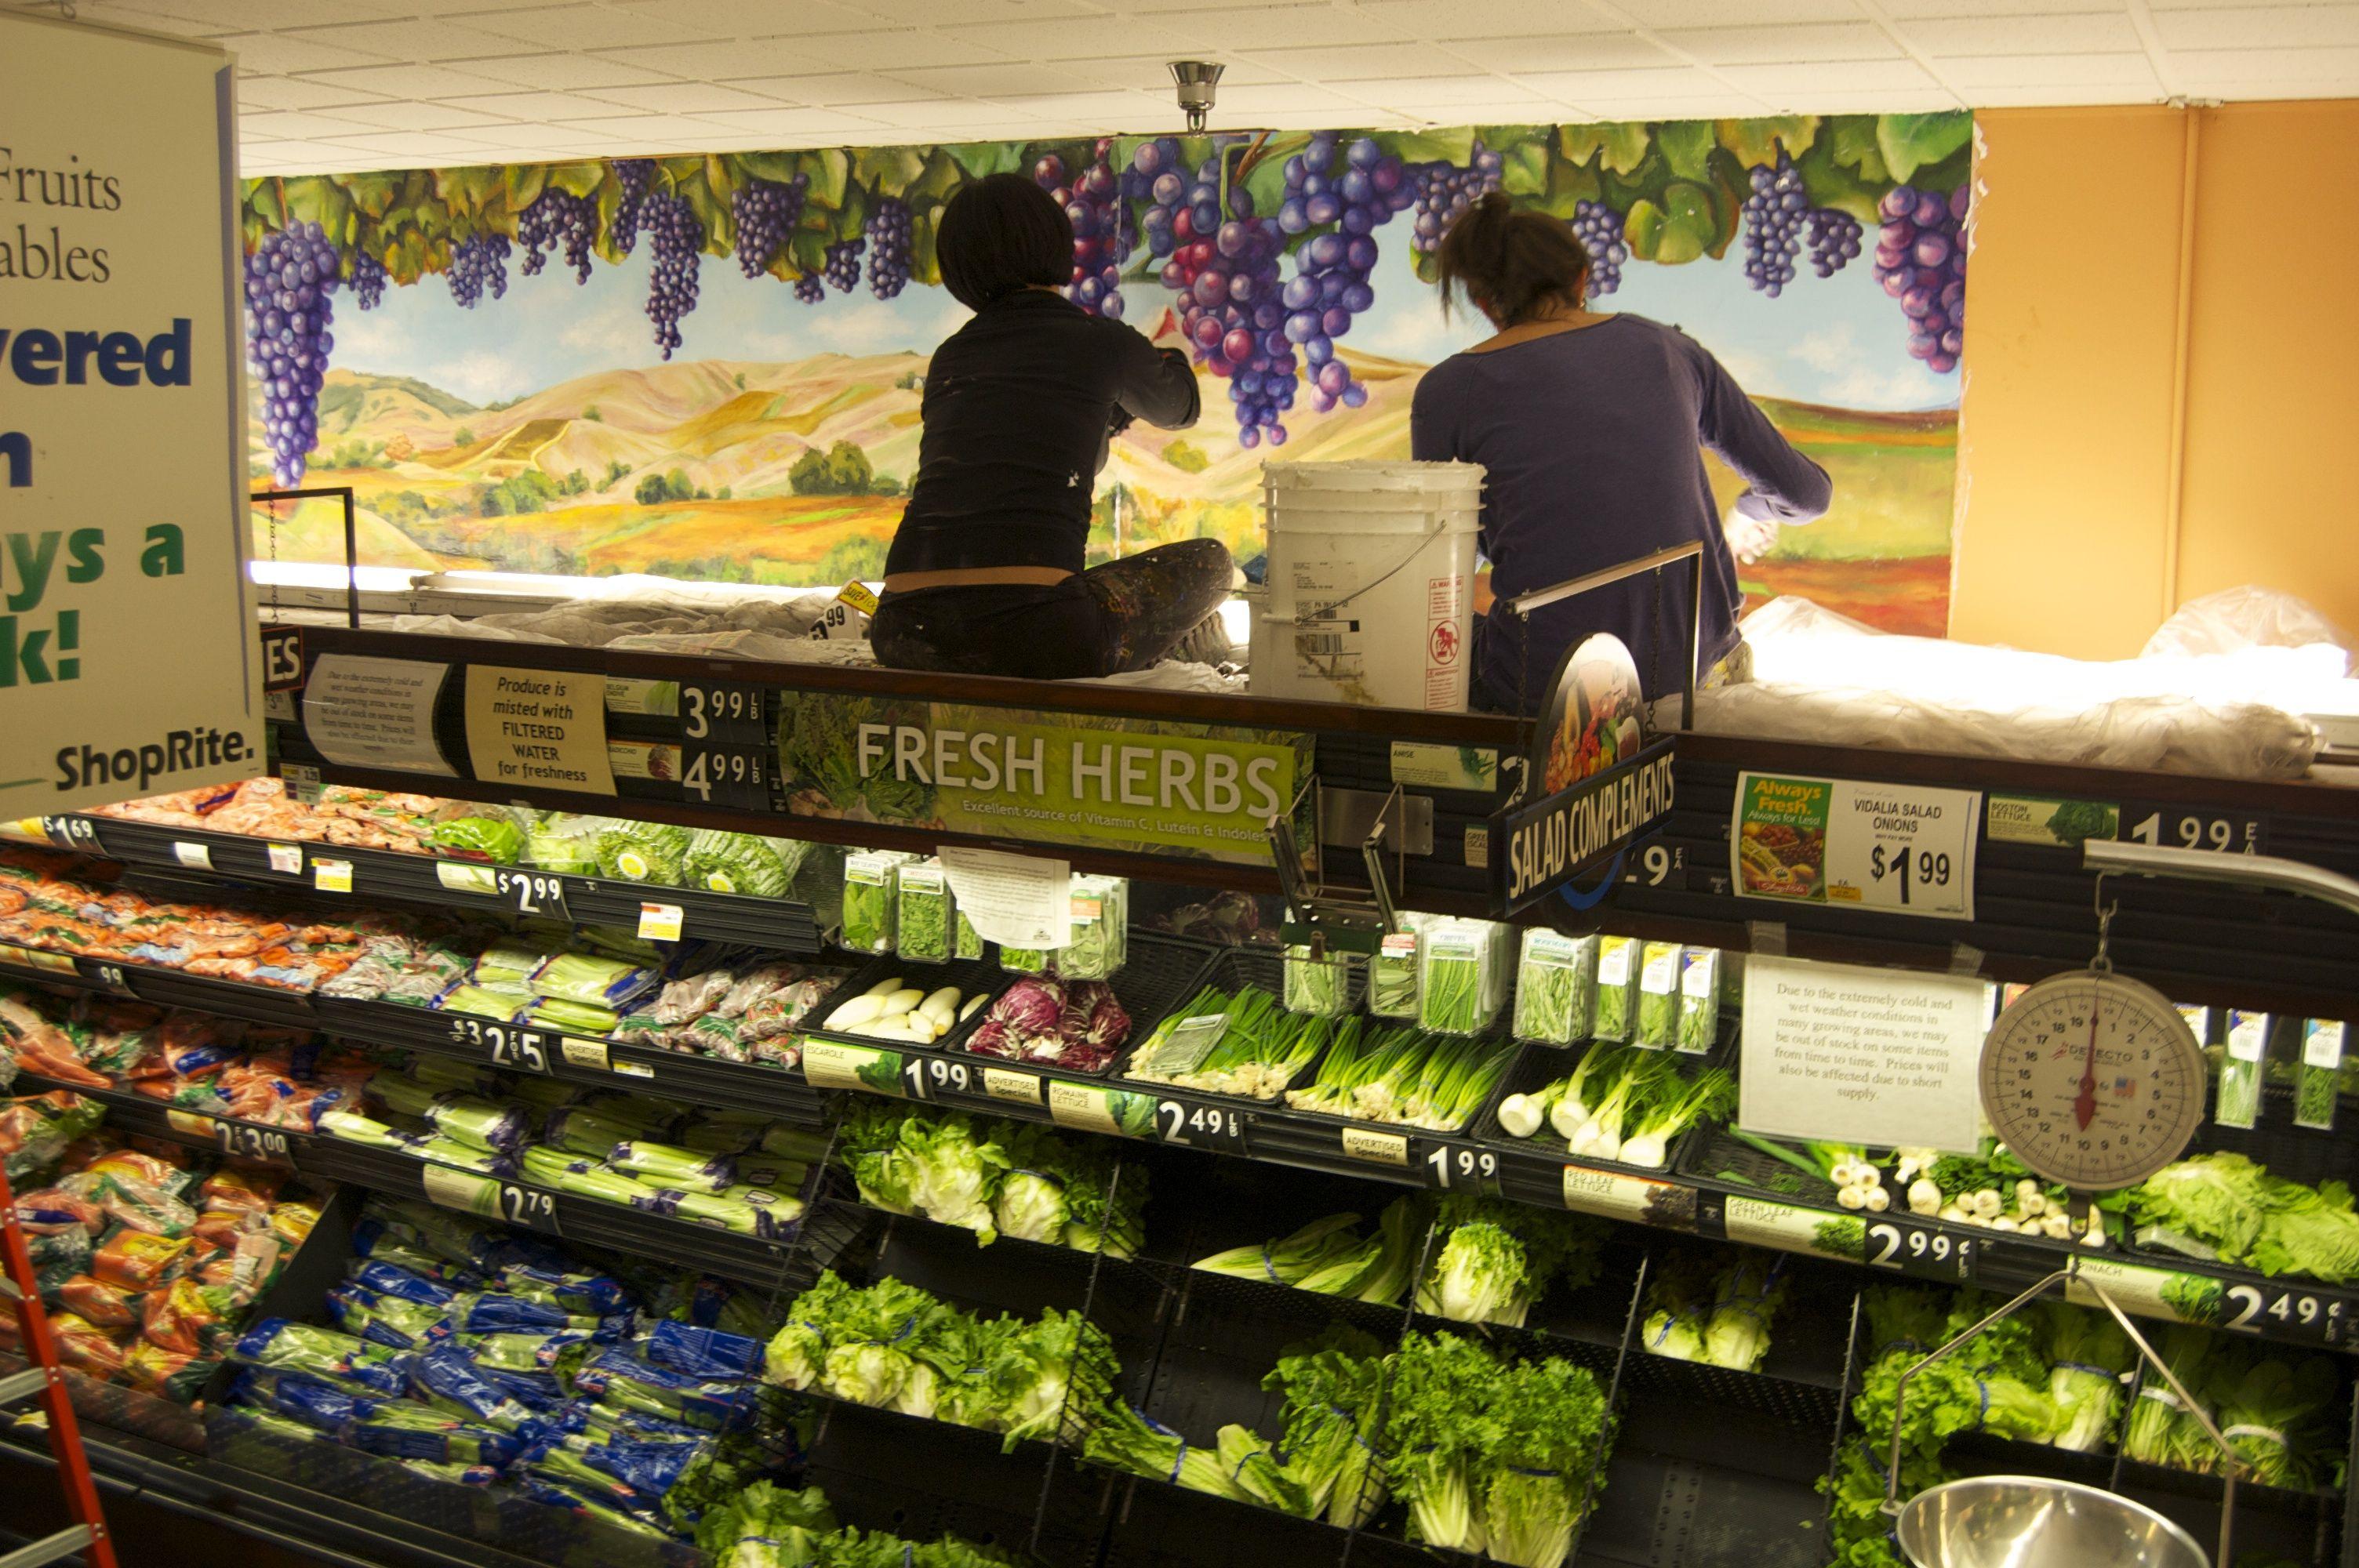 Vineyards- Colligas Family Markets, ShopRite, Snyder Plaza, Philadelphia, PA.